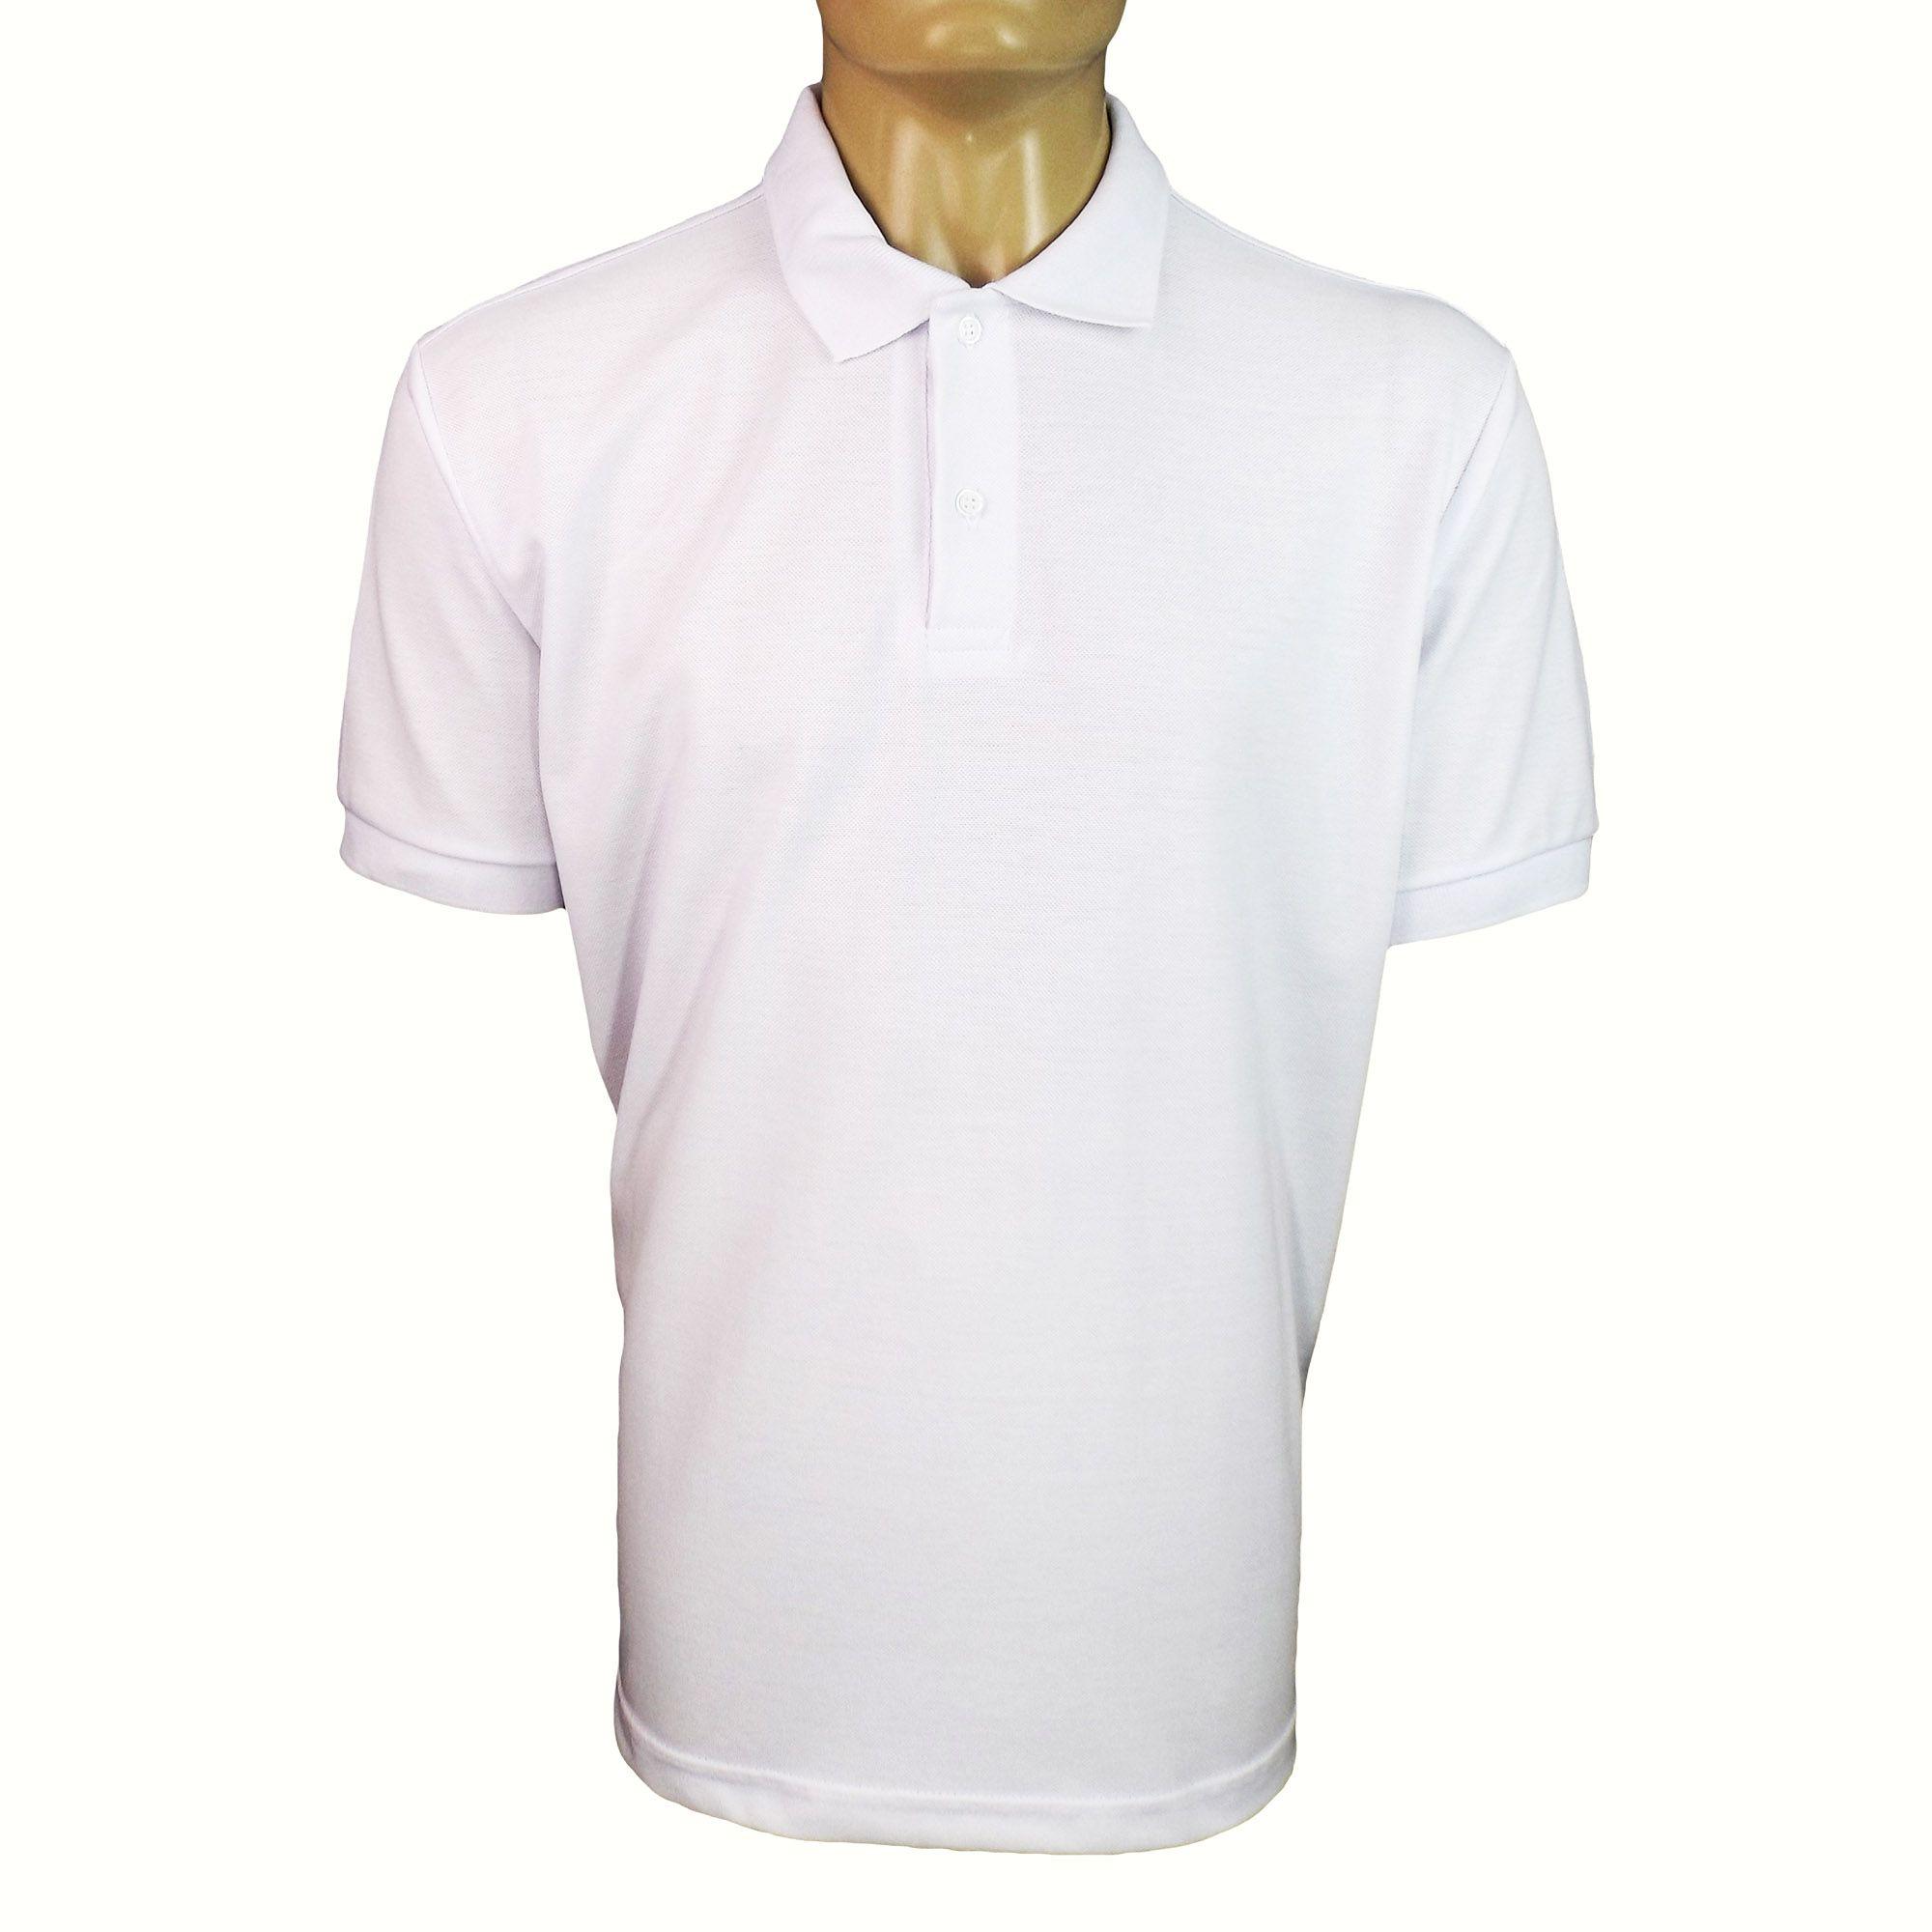 eab5e065c1 Camisa Polo Manga Curta Masculina Branca - Dr EPI - Proteção Individual